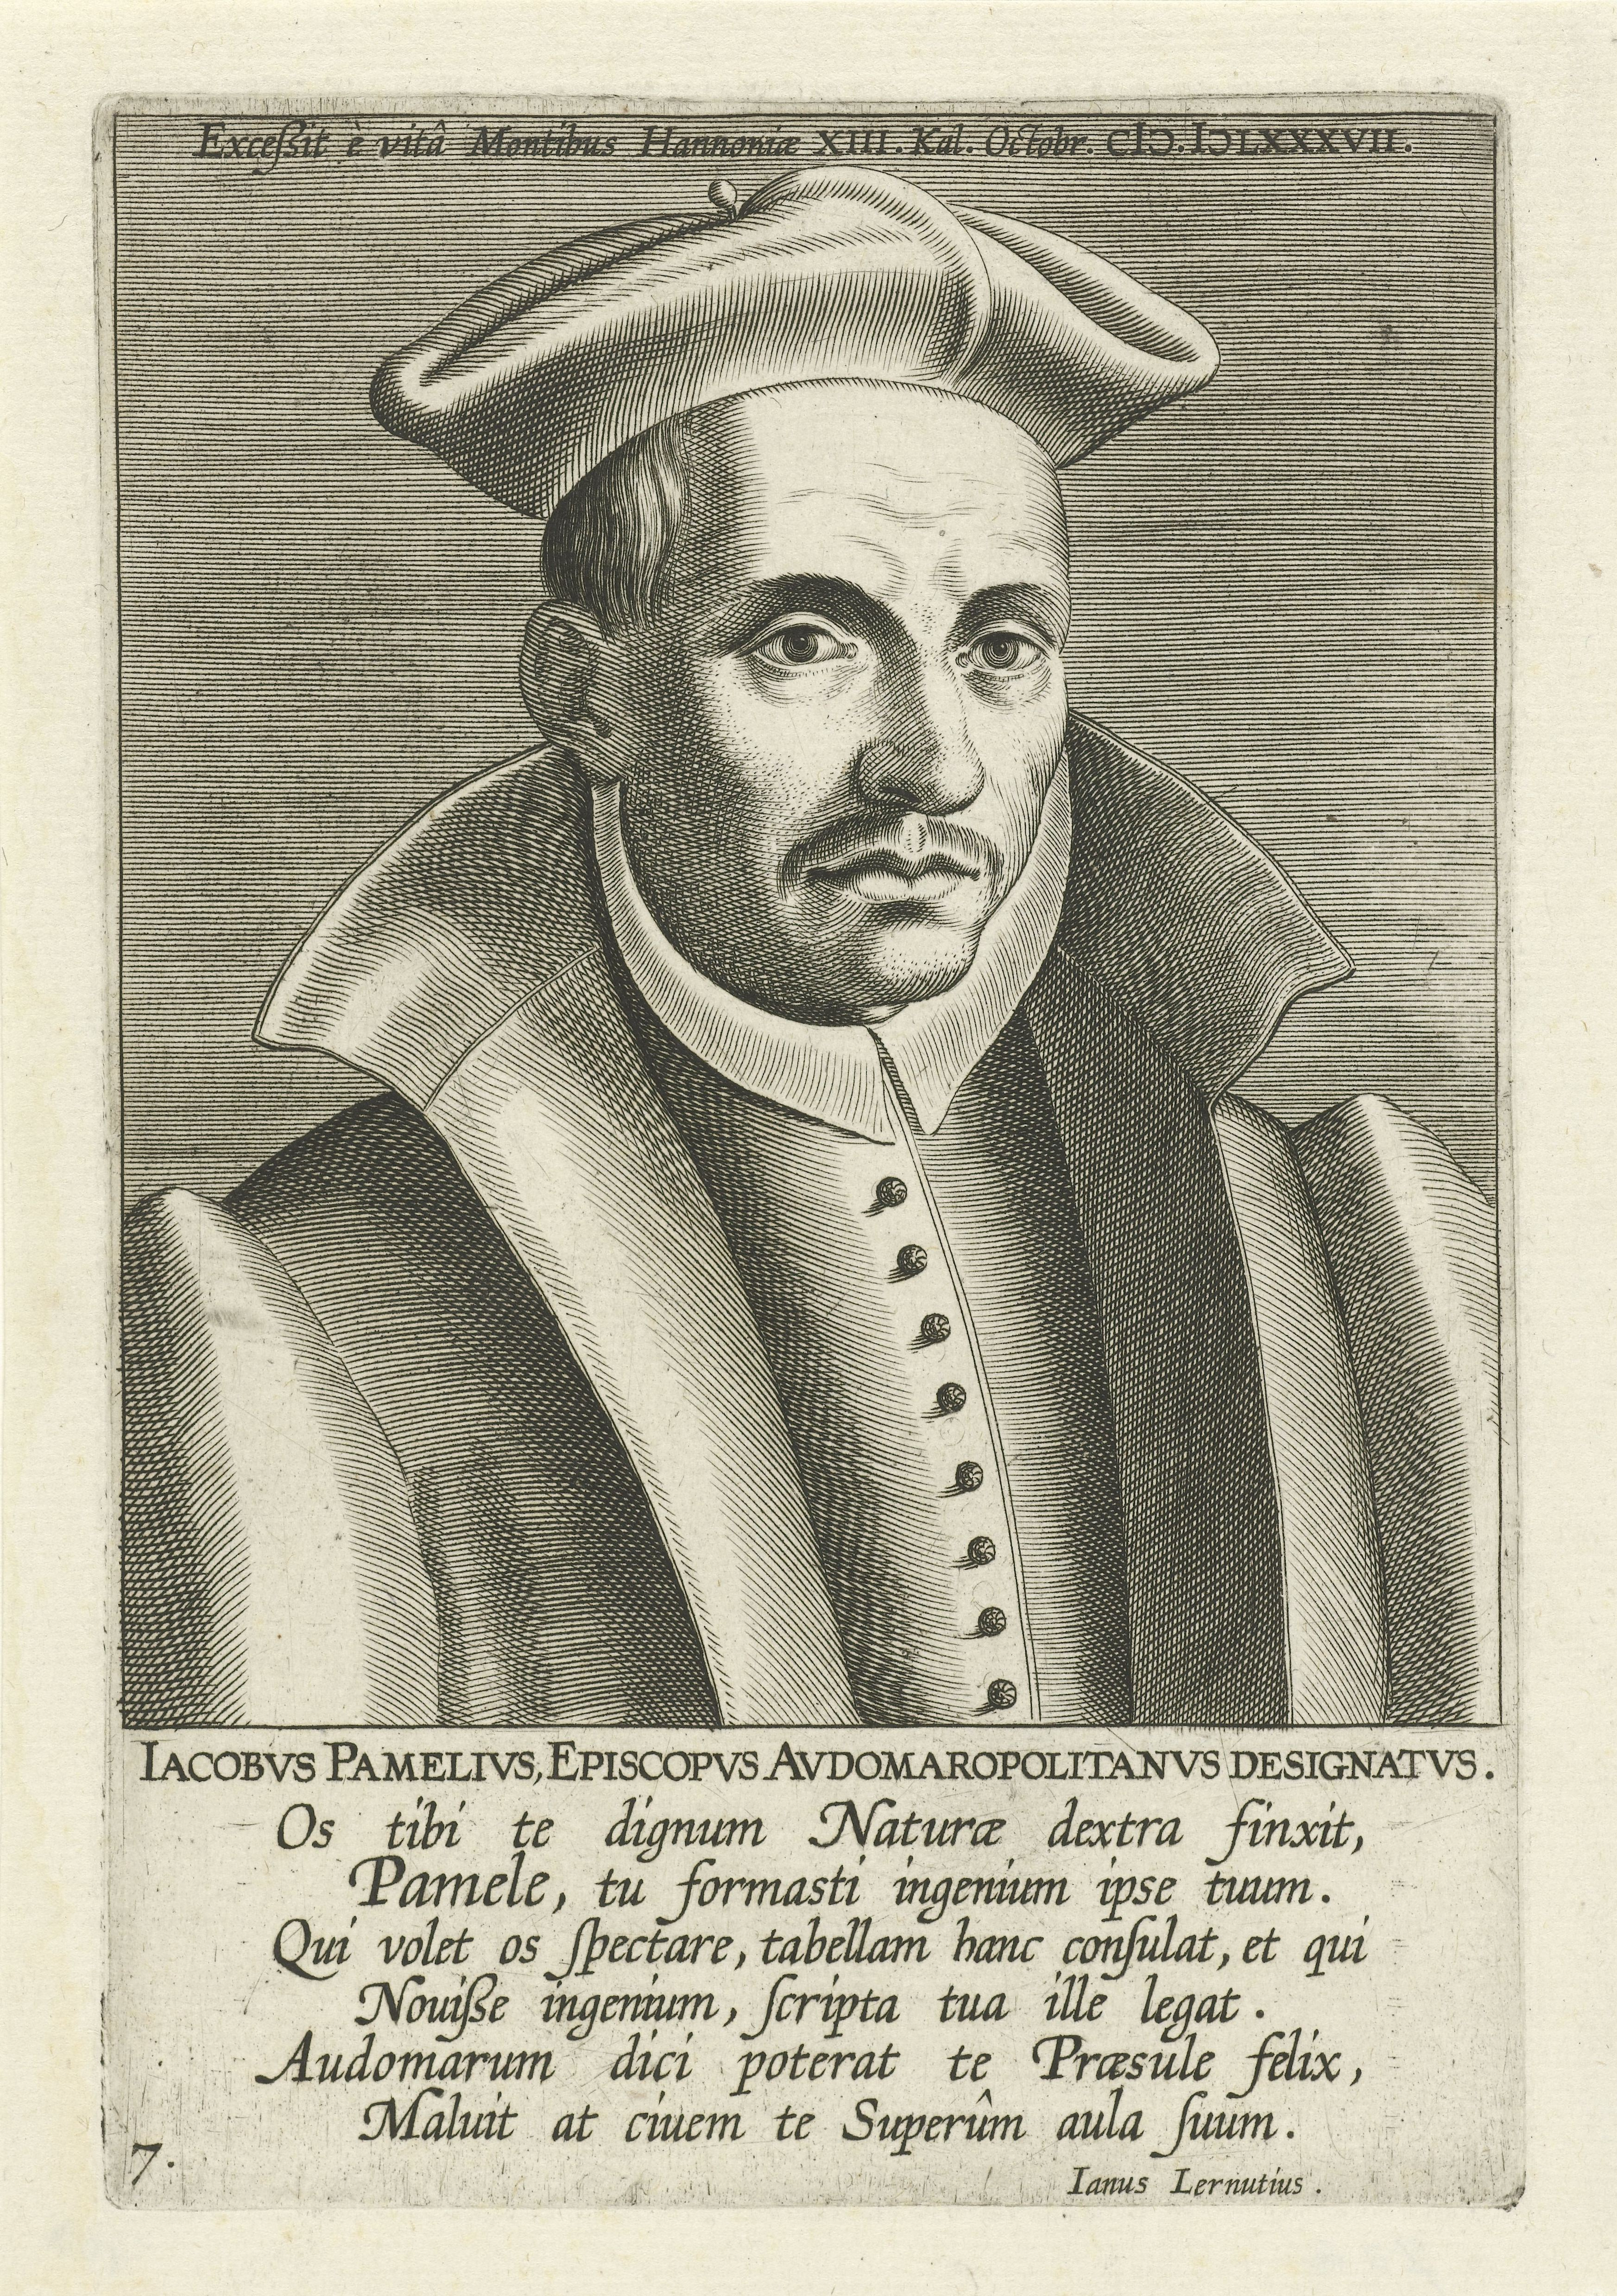 Jacobus Pamelius